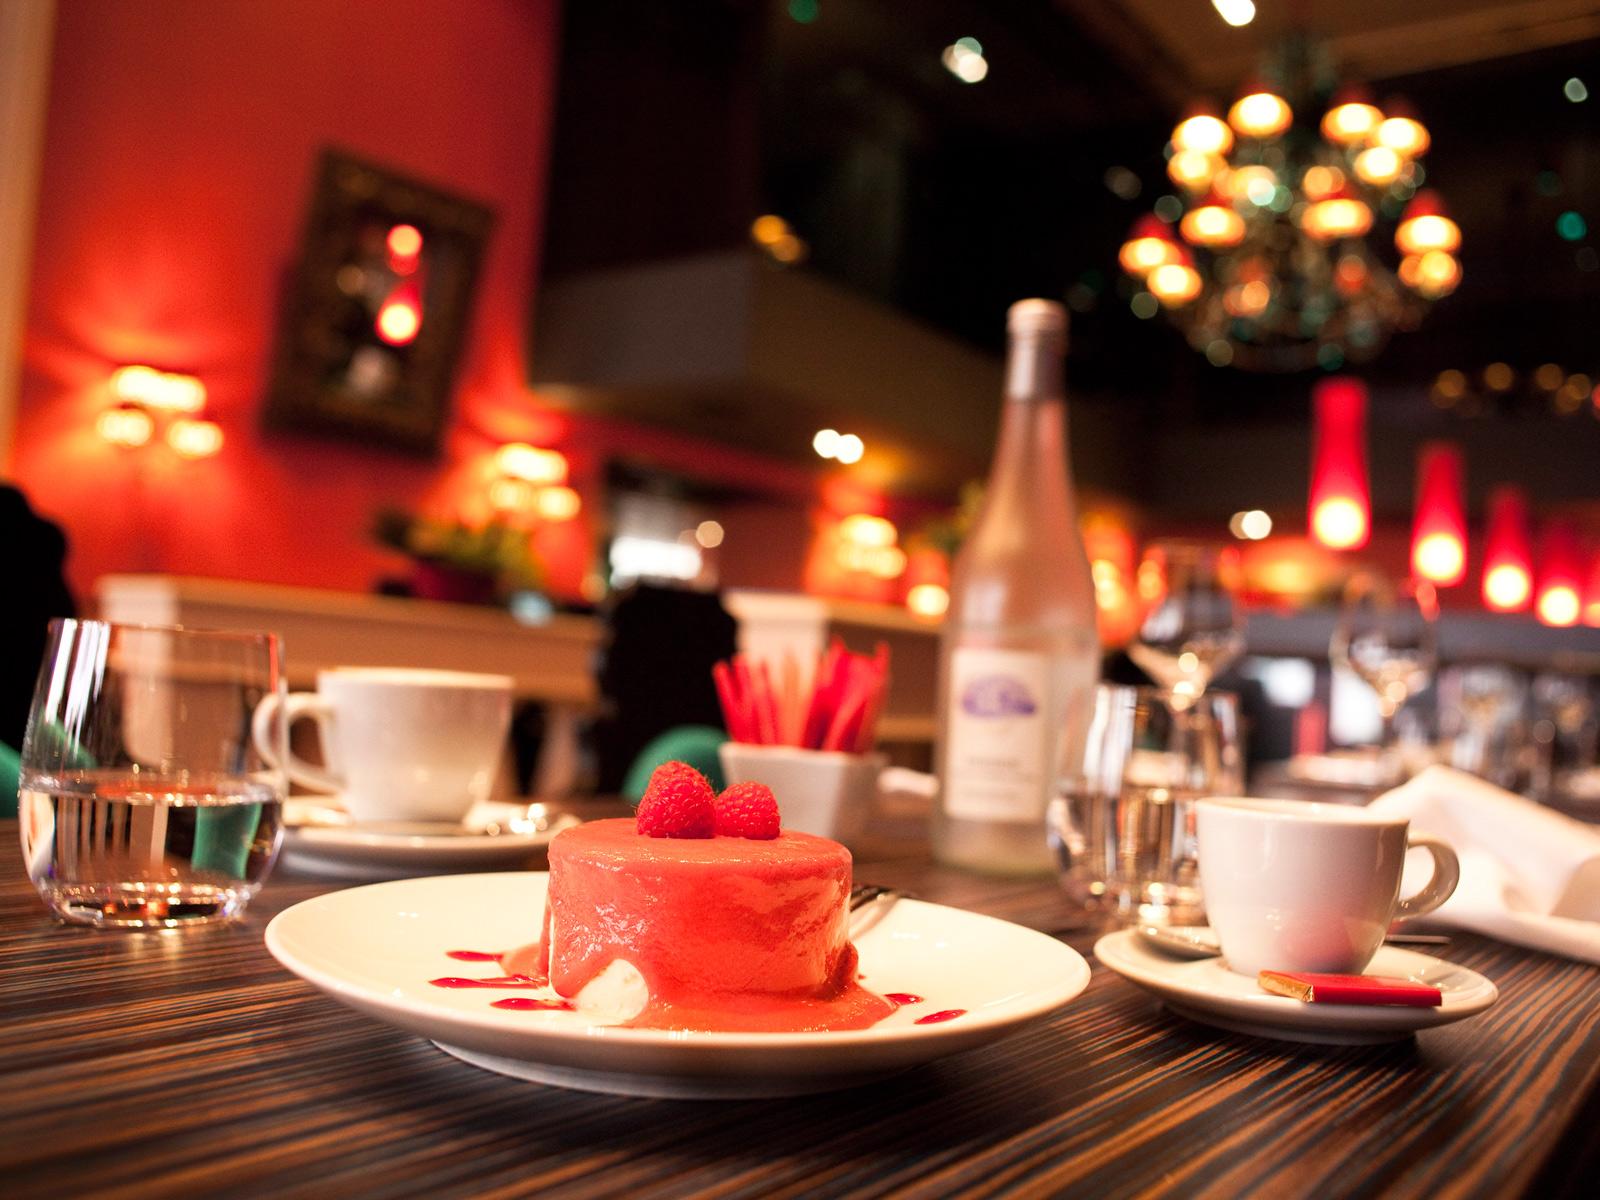 Красивые картинки кафе, картинки испания красивые